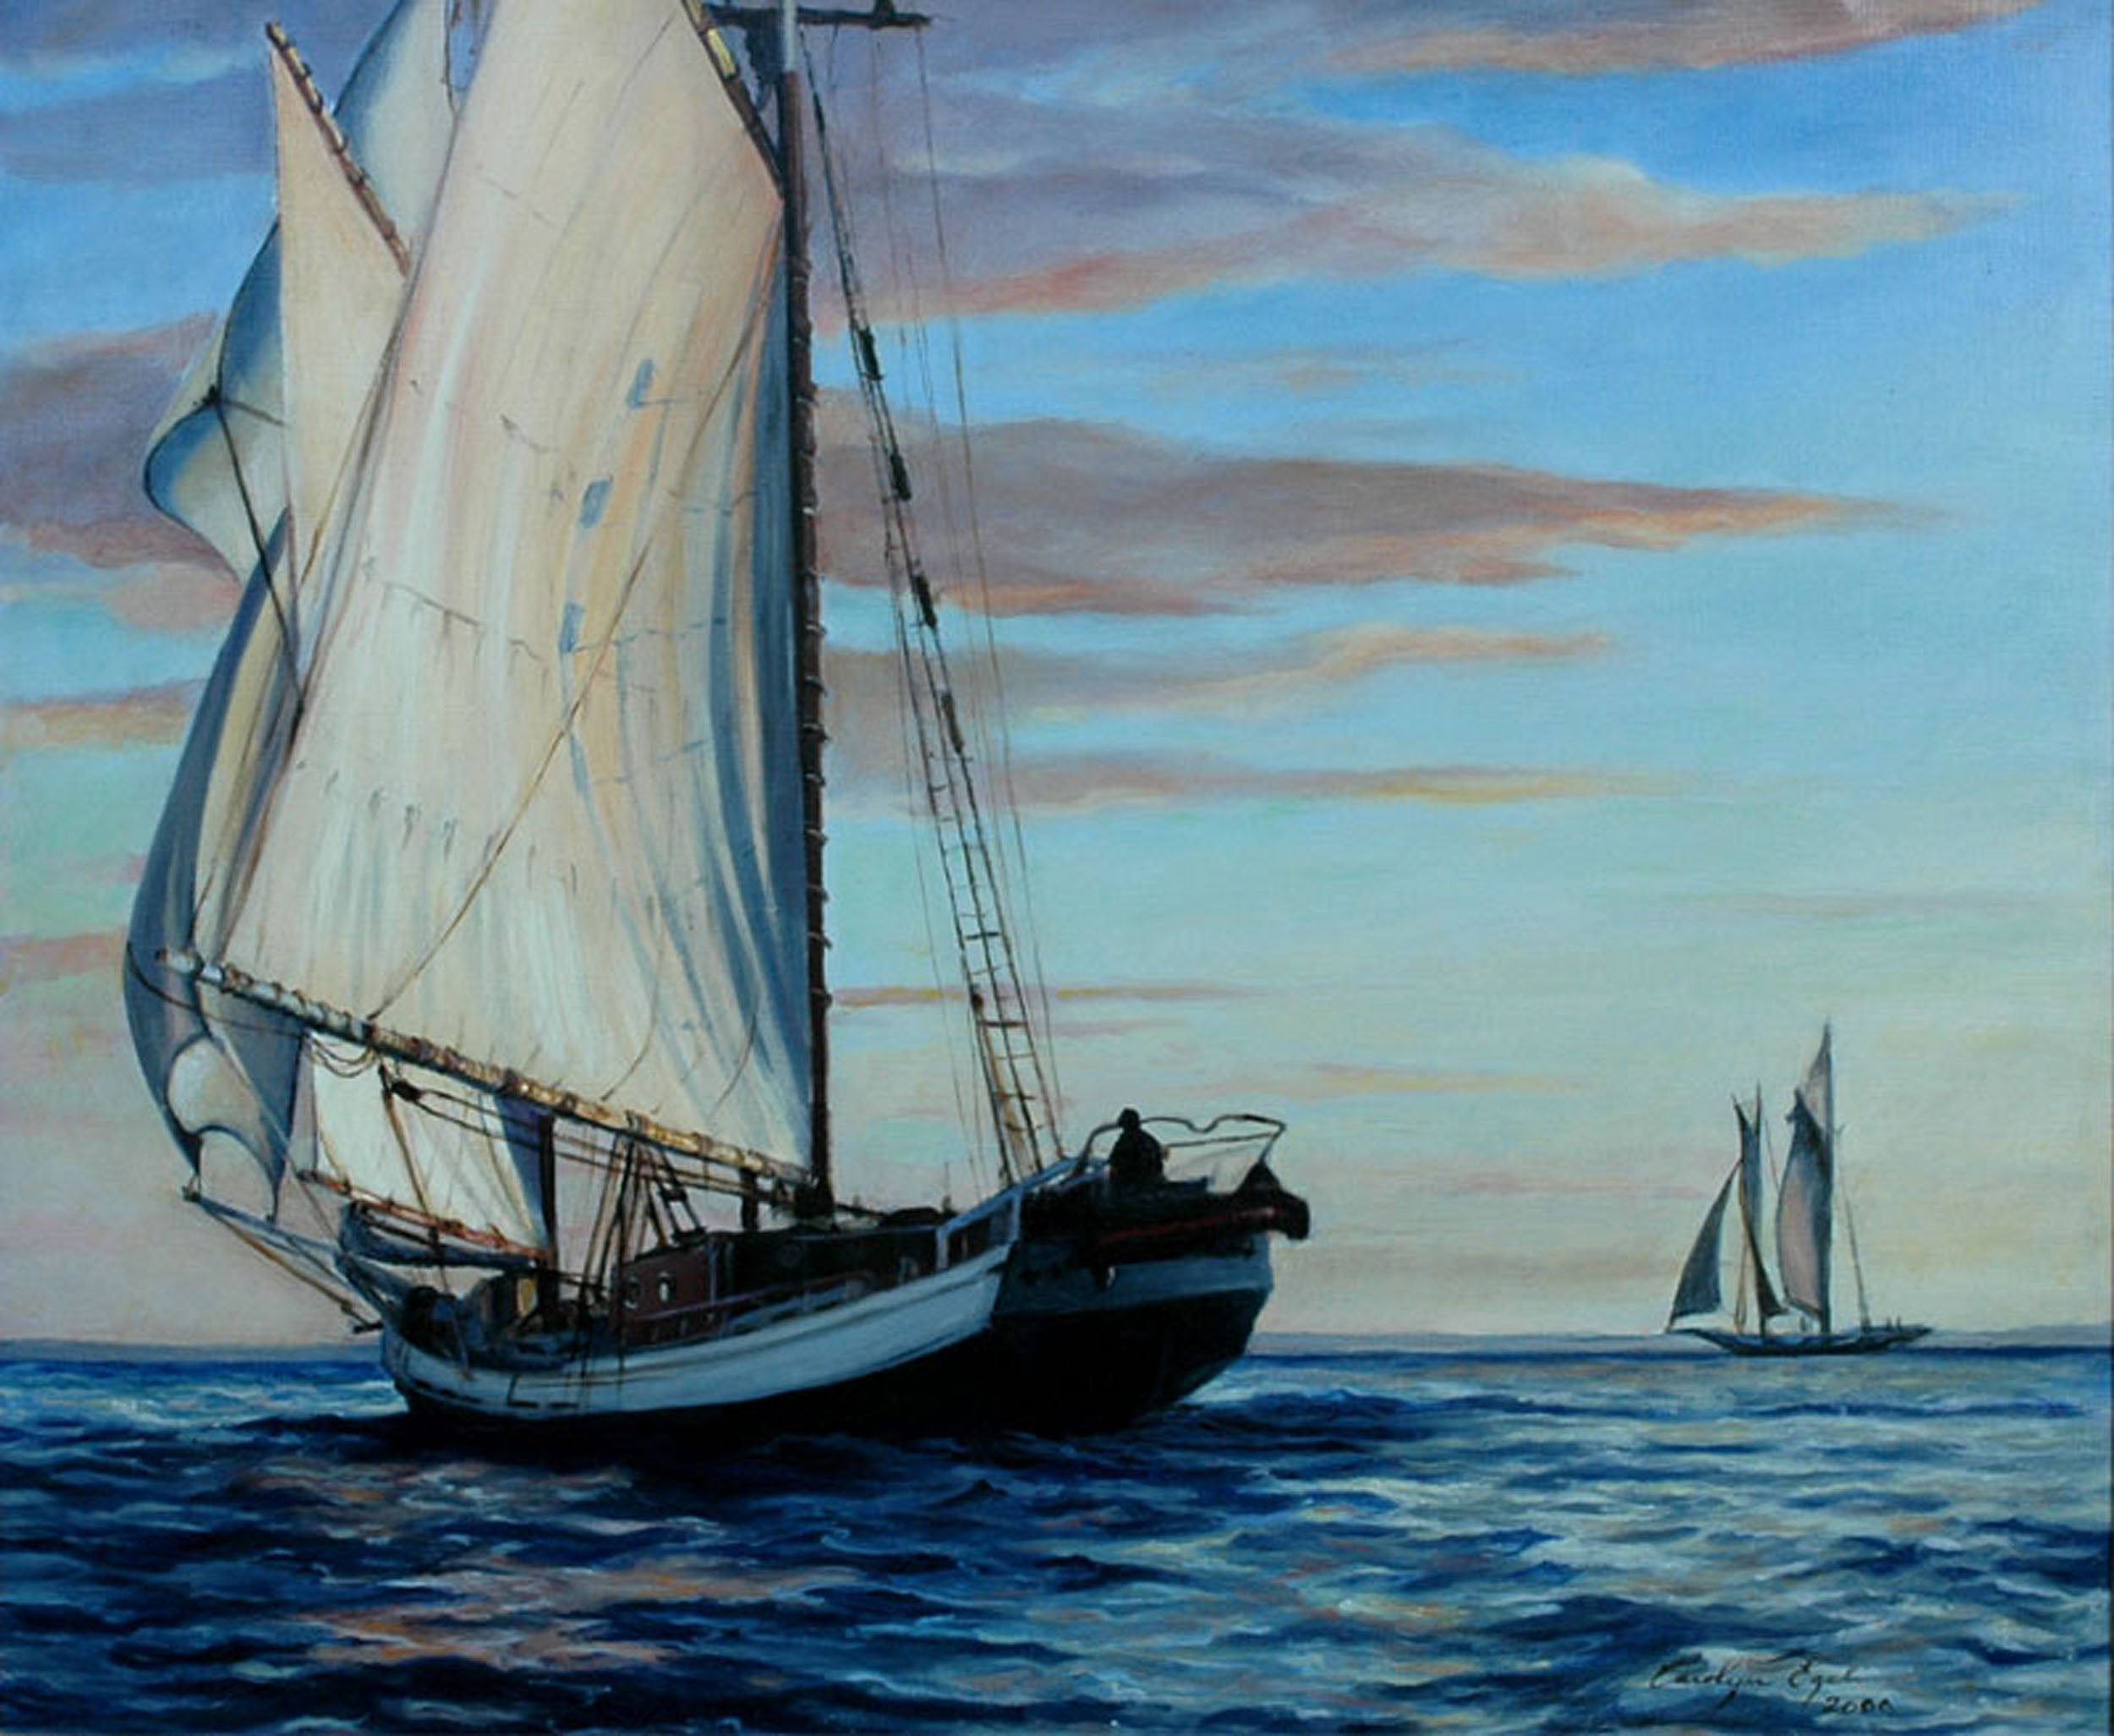 "Schooner on the Chesapeake, Evening Sail, 30"" x 36"", NFS"